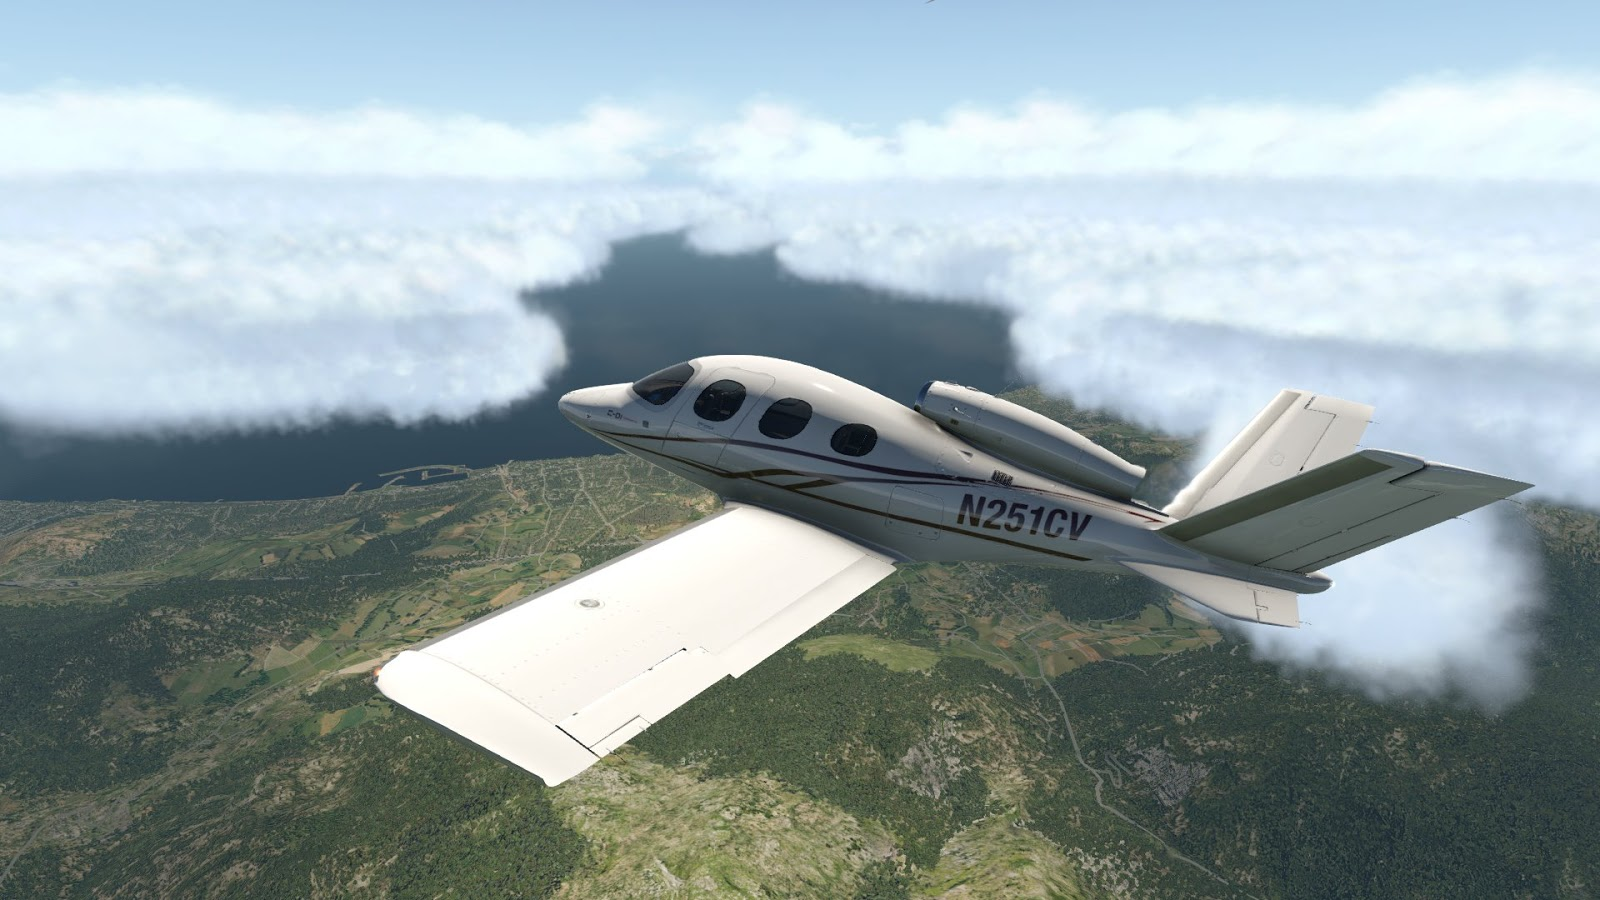 IndiaFoxtEcho Visual Simulations: Impressions on X-Plane 11